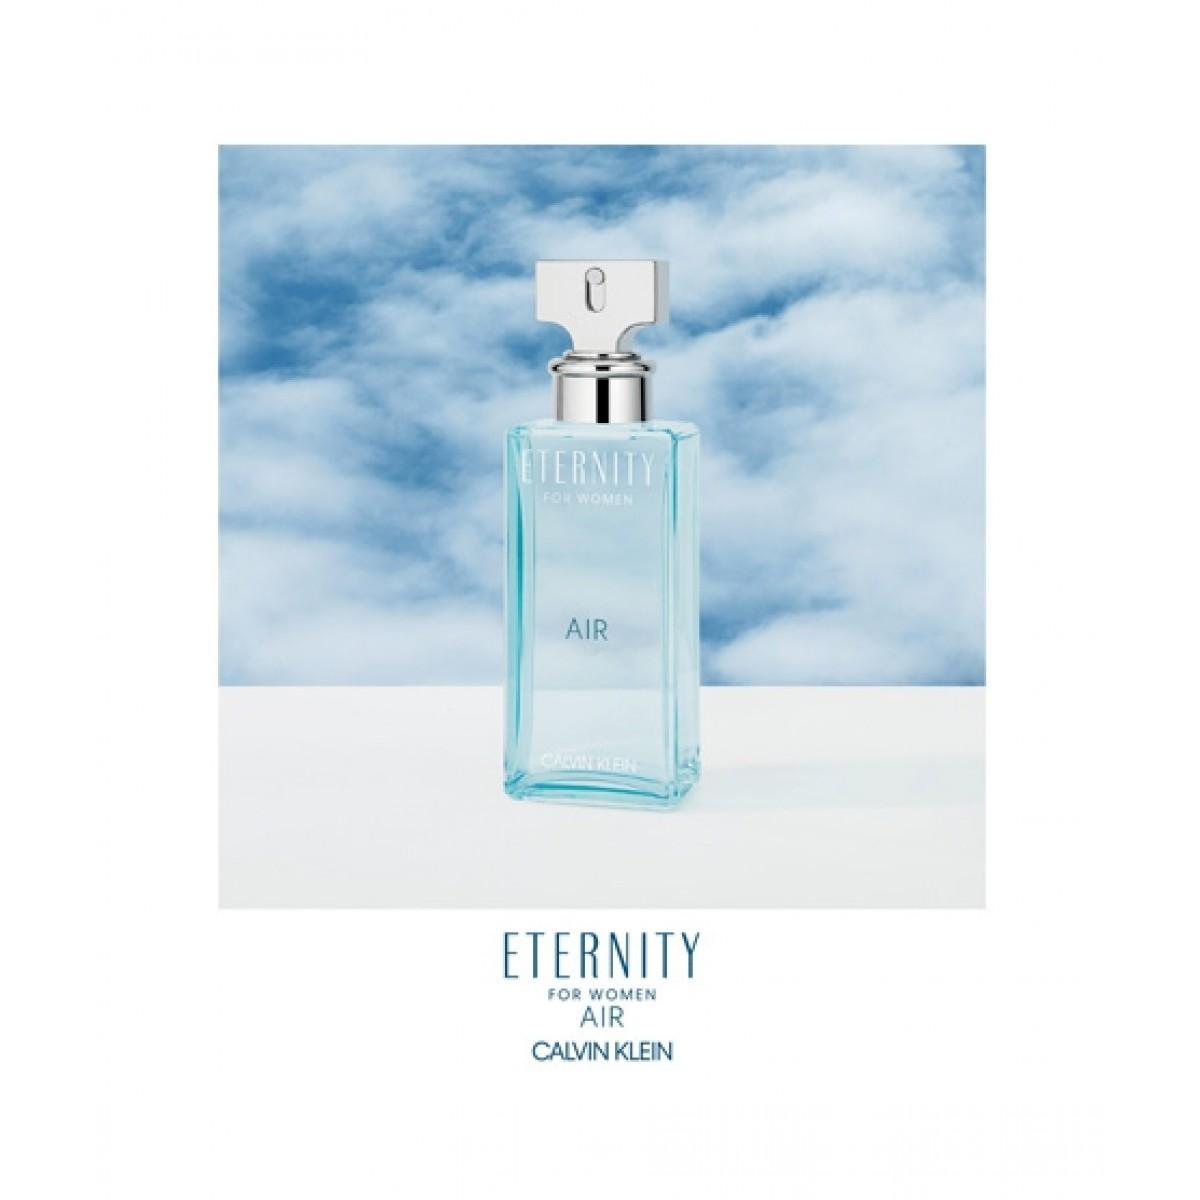 0fdf91ef58 Calvin Klein Eternity Air Perfume 50ml Price in Pakistan | Buy Calvin Klein  Air Eau De Parfum For Women | iShopping.pk